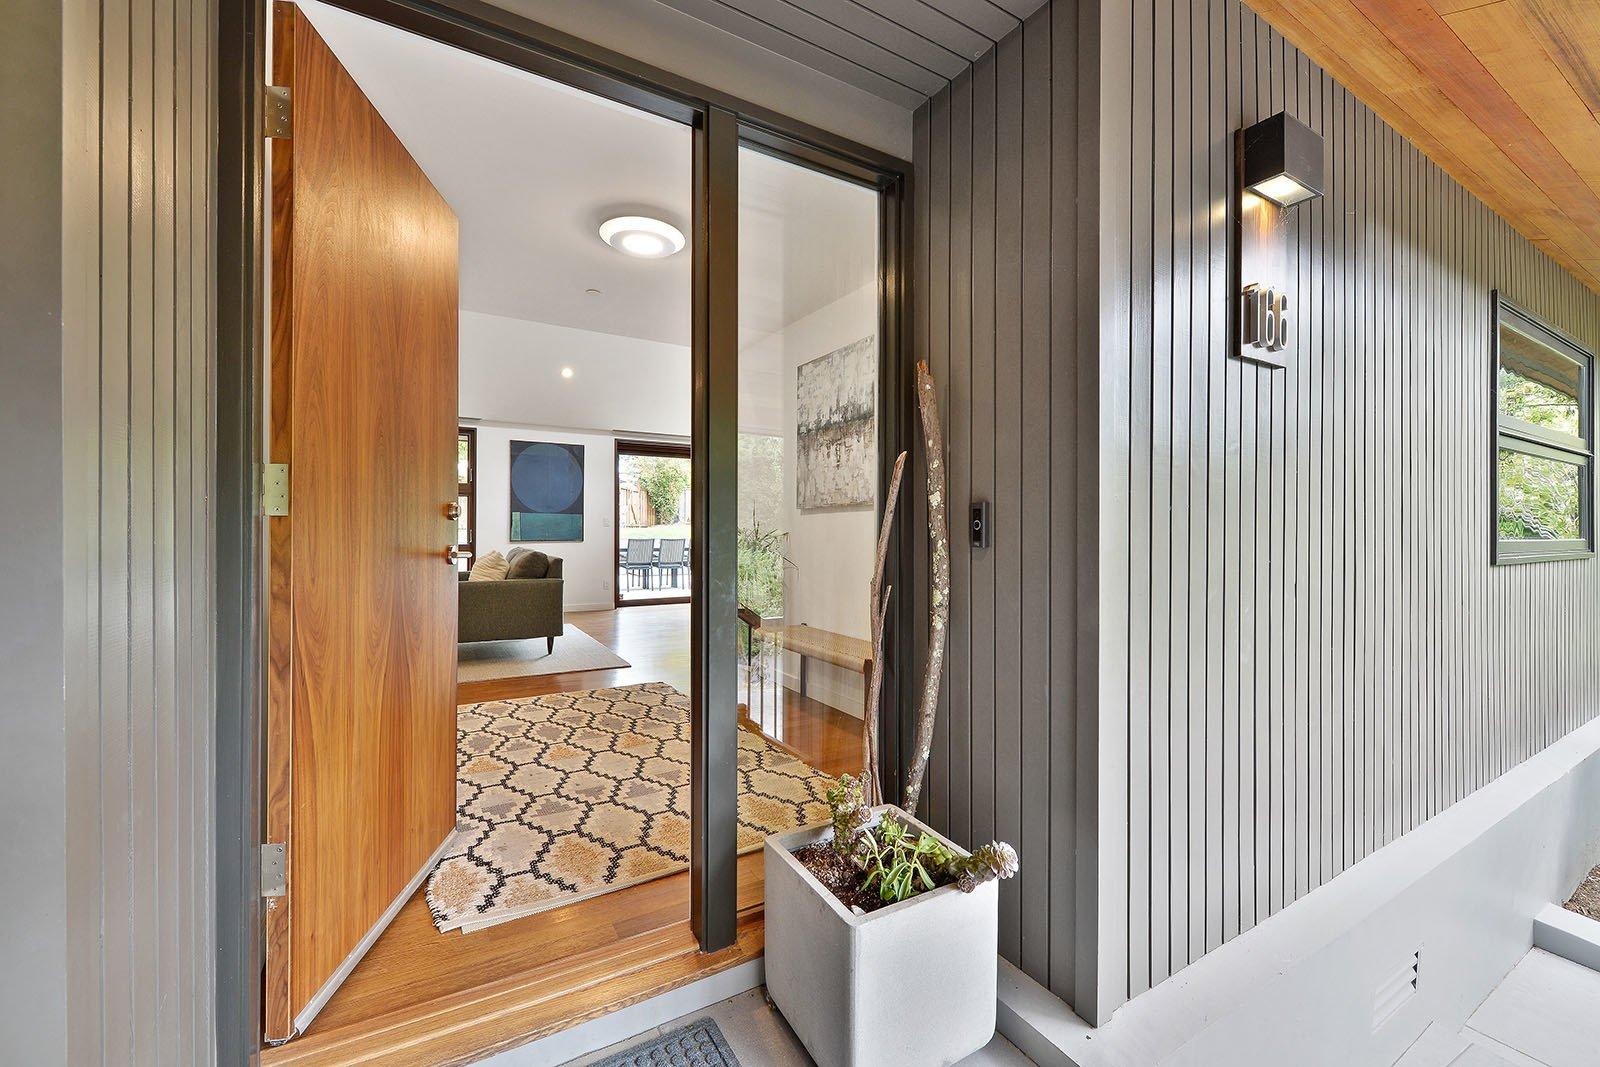 Outdoor, Front Yard, Pavers Patio, Porch, Deck, Small Patio, Porch, Deck, and Tile Patio, Porch, Deck Front door  Portola Valley by patrick perez/designpad architecture